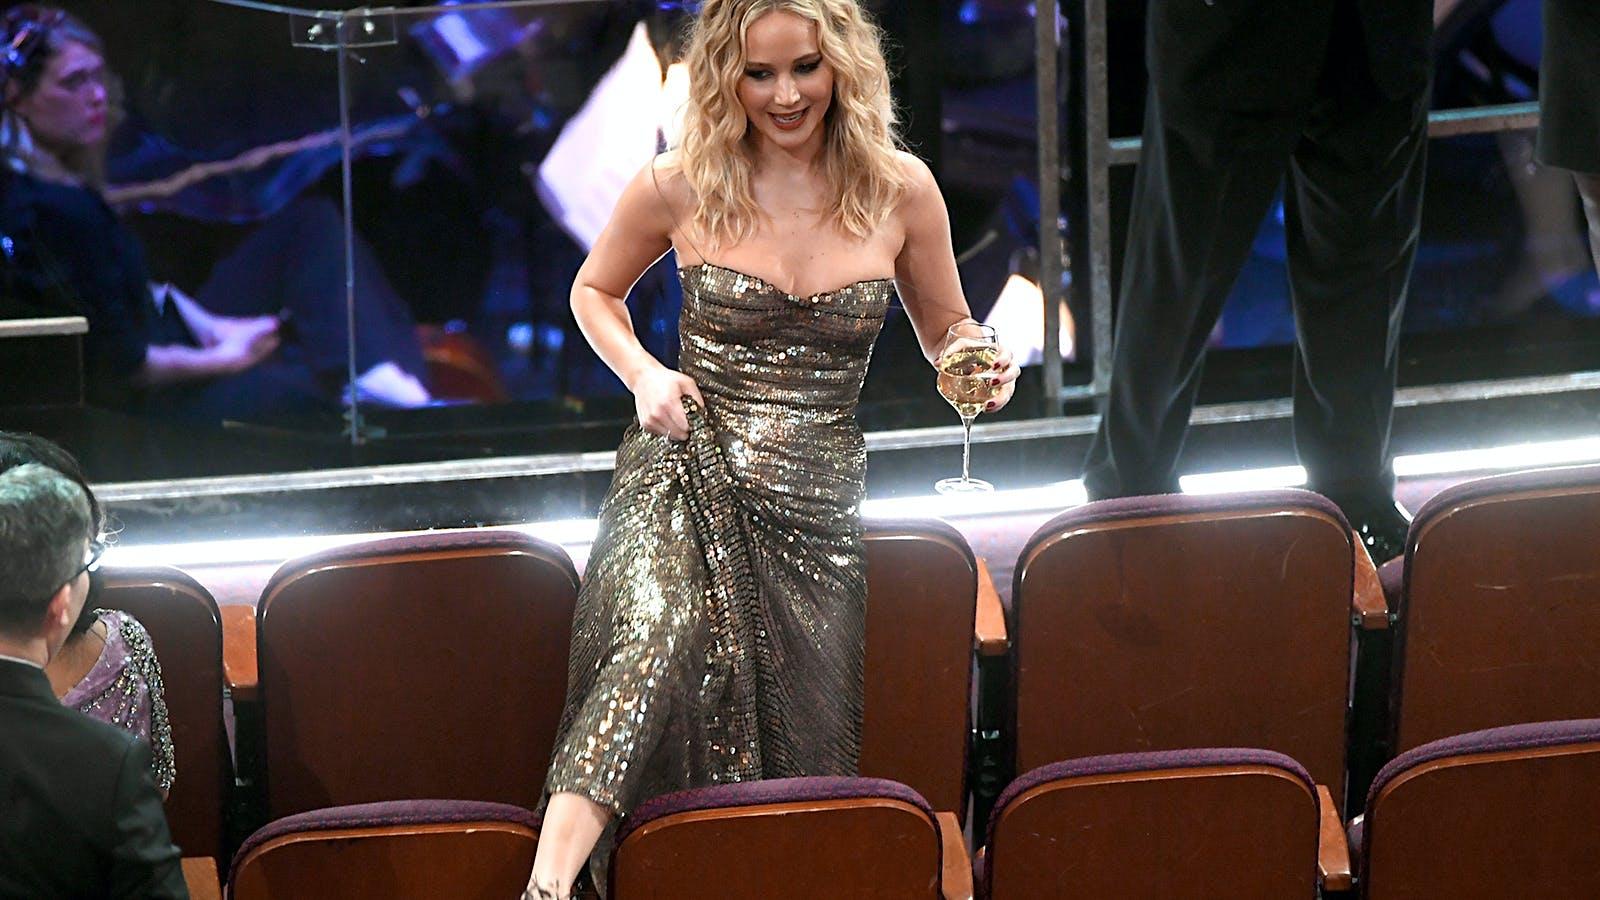 Jennifer Lawrence Juggles Wine, Wolfgang Puck('s Photog) Fights Crime at Oscars